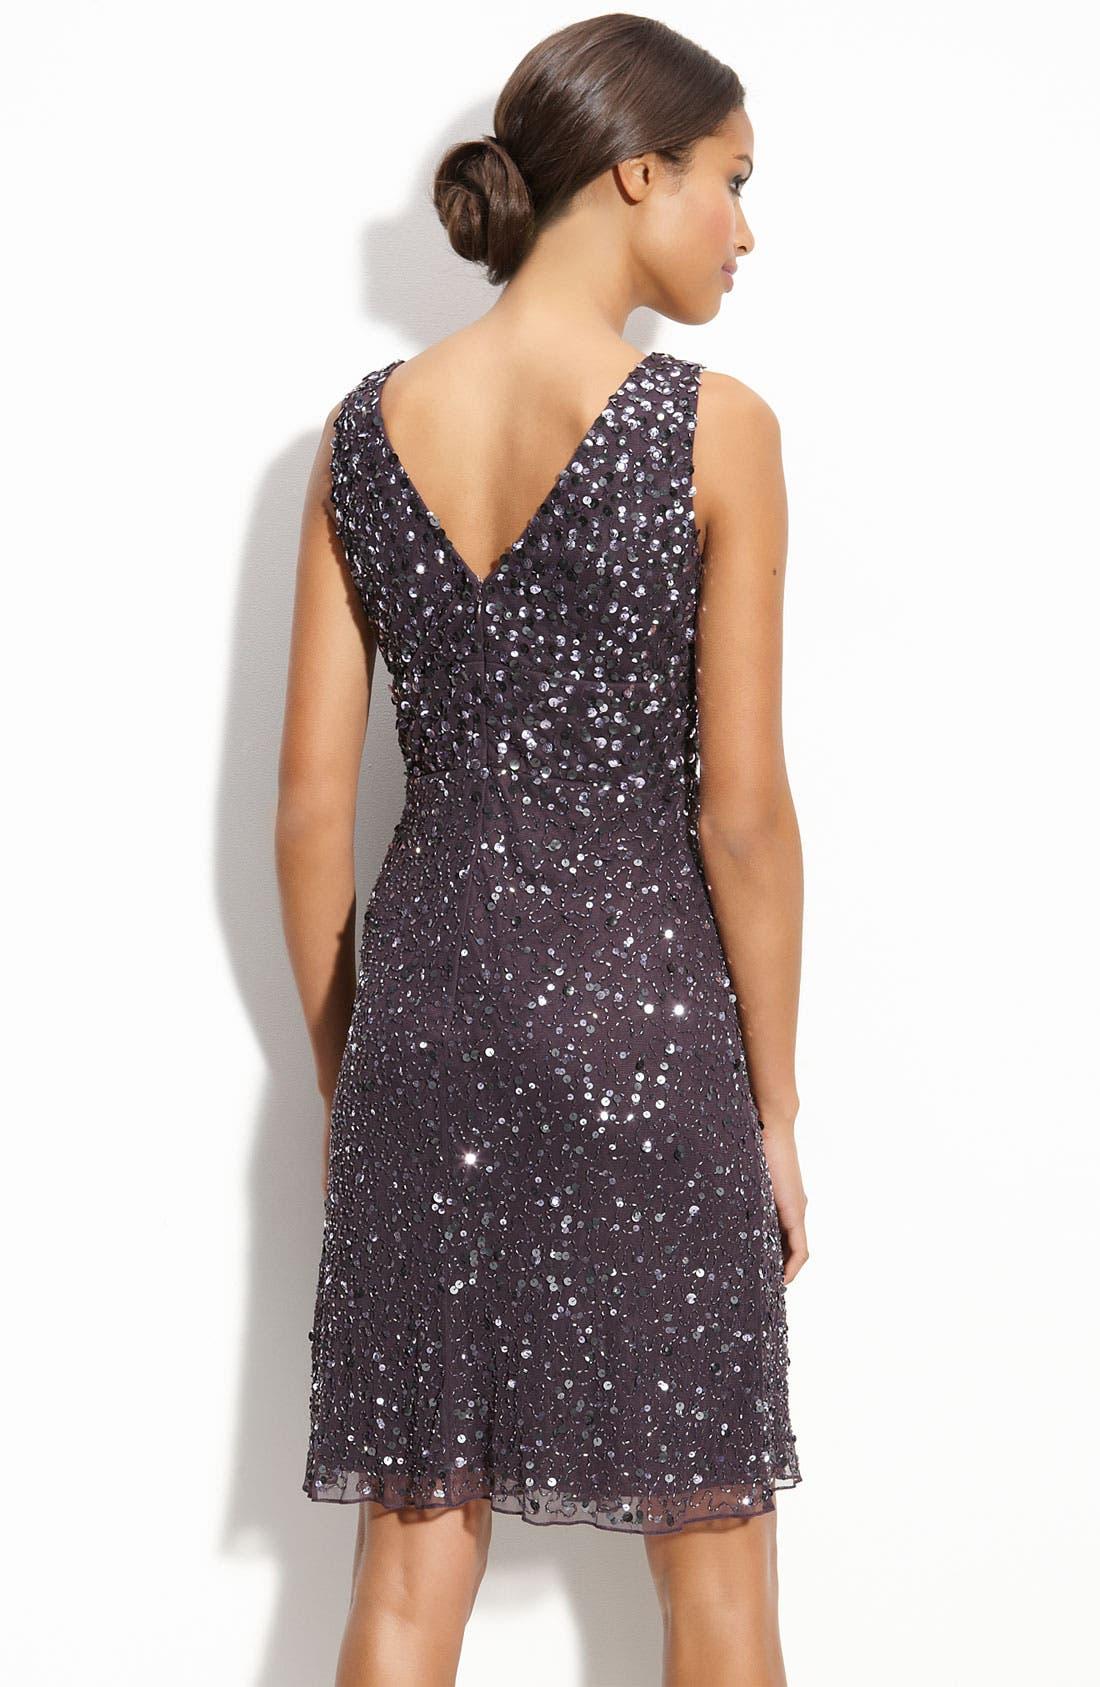 PATRA,                             Sequin Mesh Dress,                             Alternate thumbnail 2, color,                             206